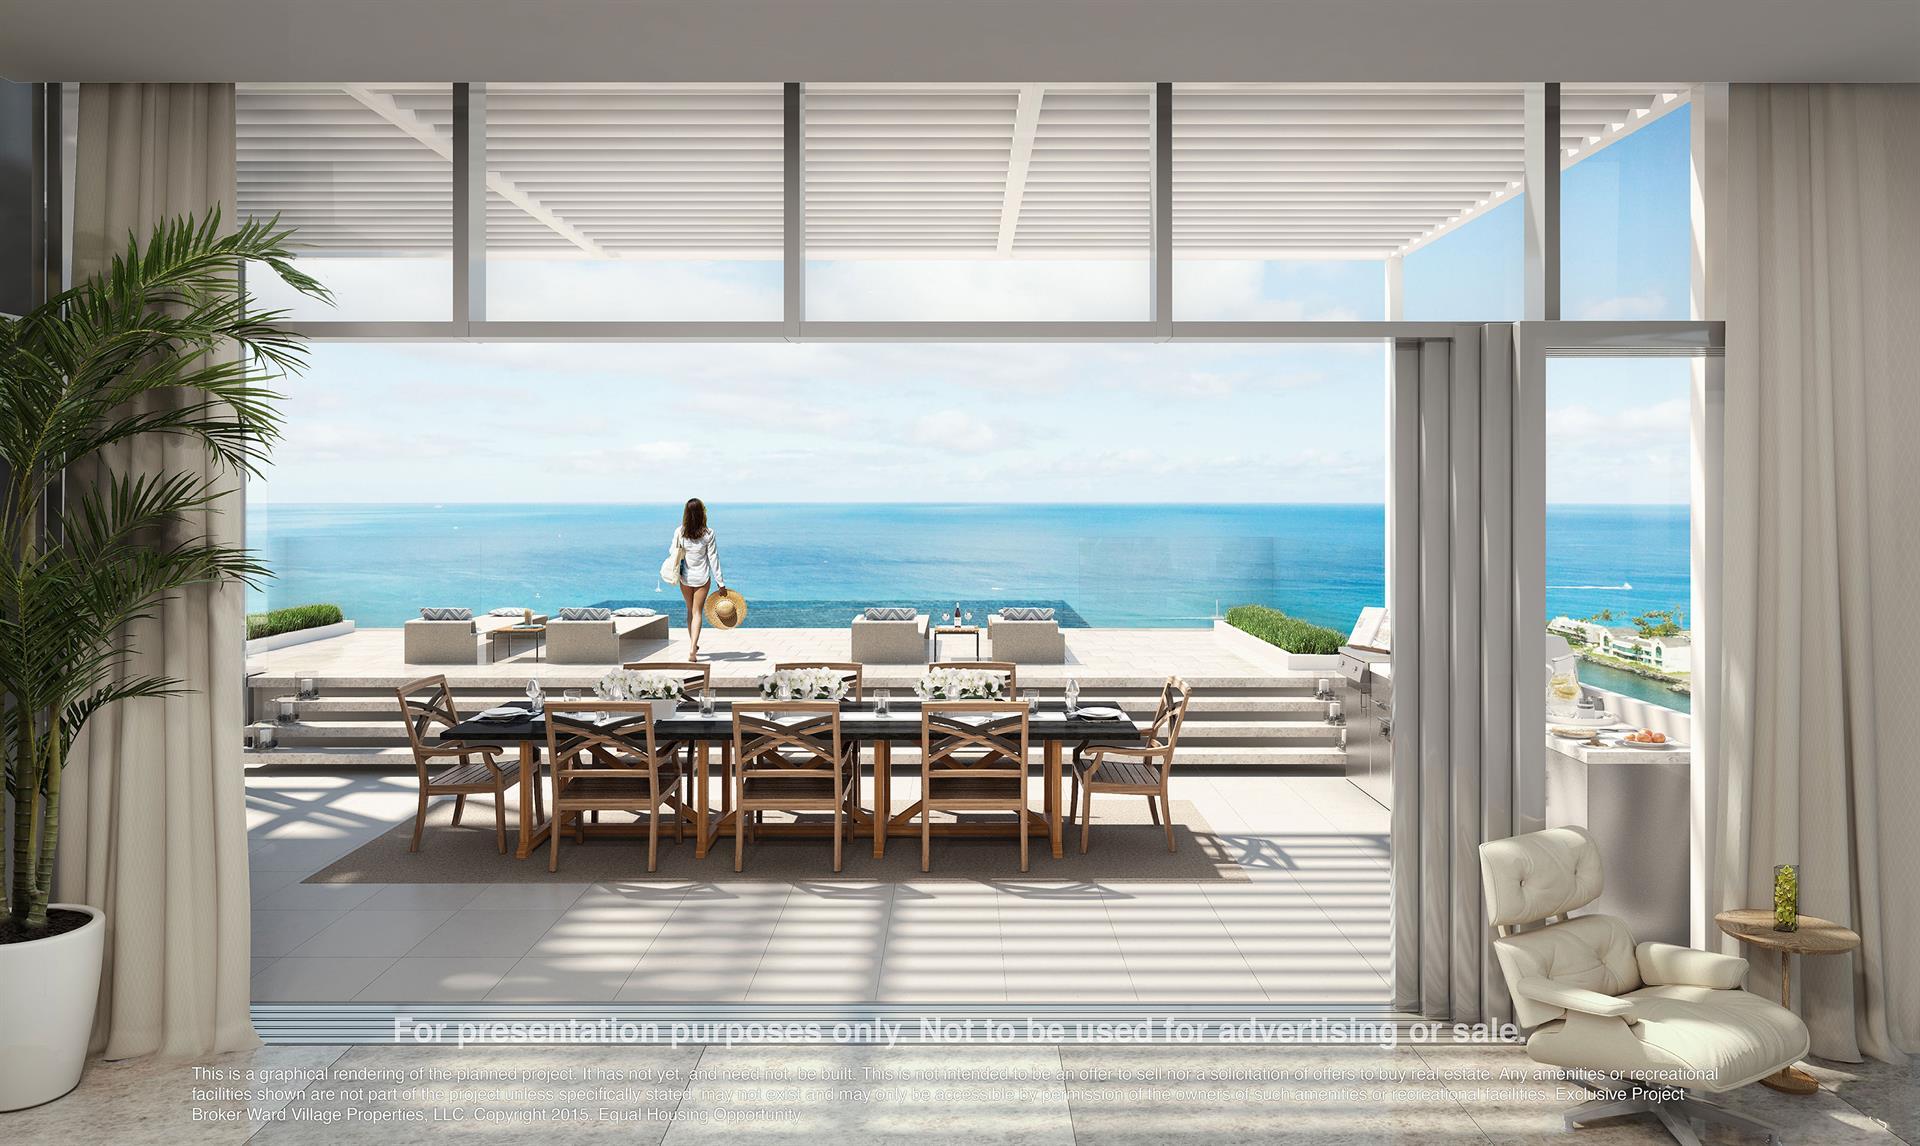 Additional photo for property listing at 1118 Ala Moana Blvd 1118 Ala Moana Blvd Honolulu, Hawaii 96814 United States